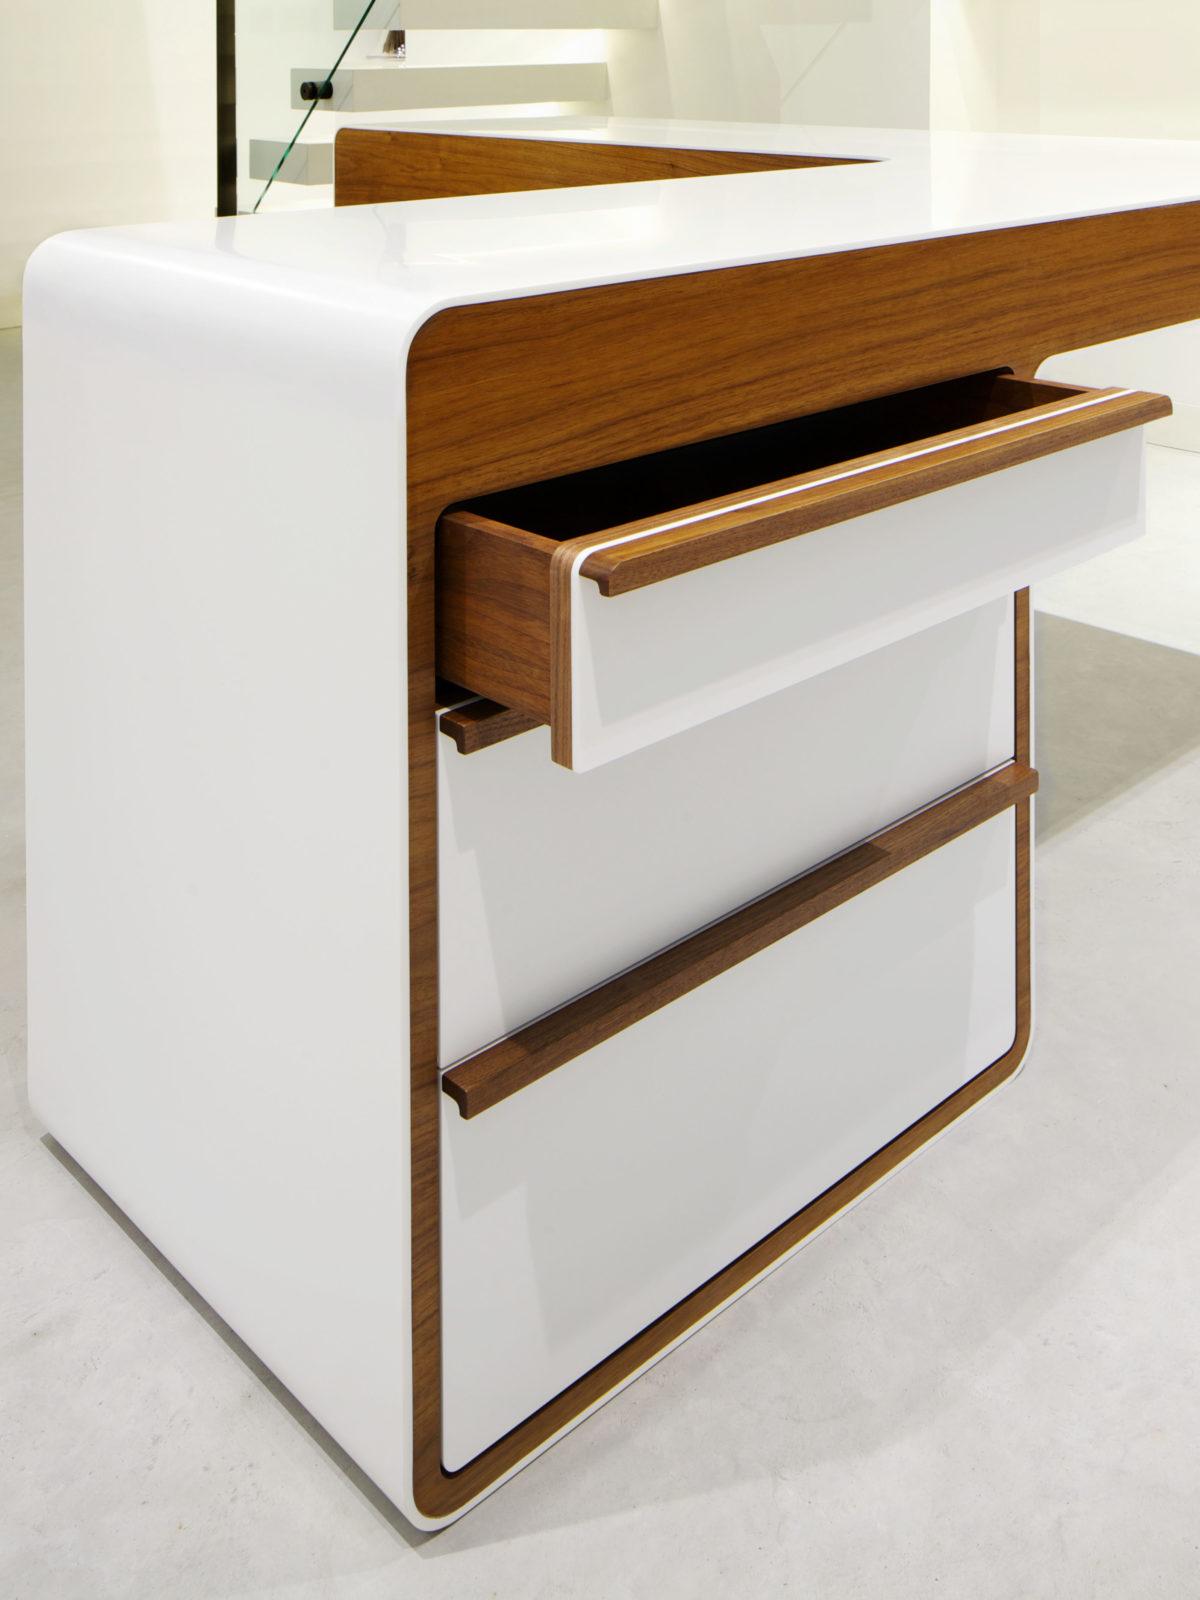 Corian desk with walnut drawer handle